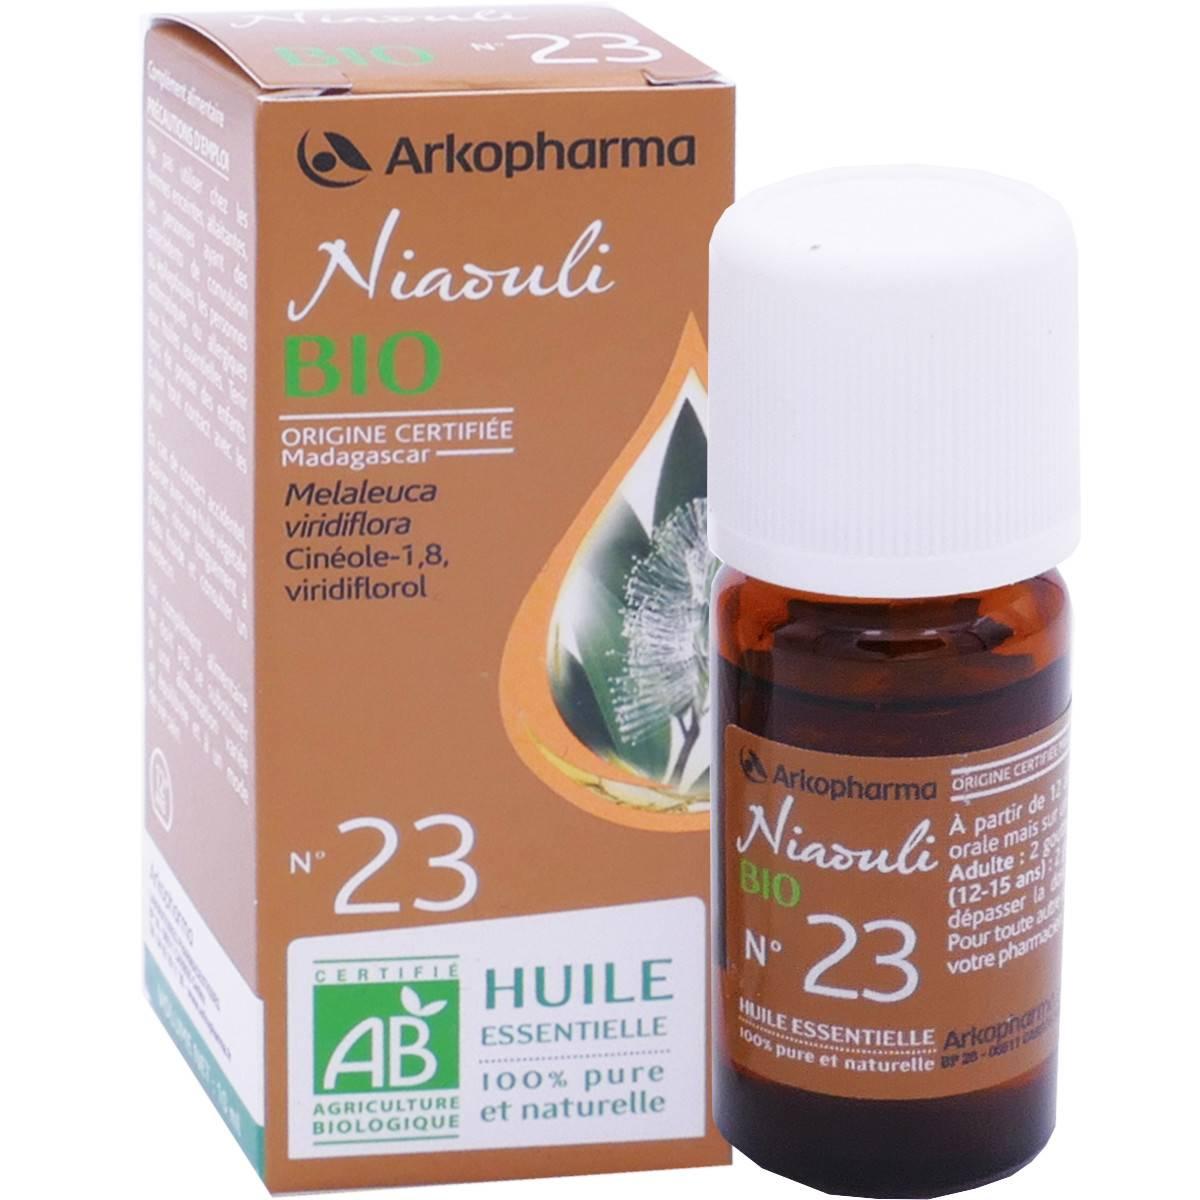 Arkopharma huile essentielle niaouli bio n°23 10 ml